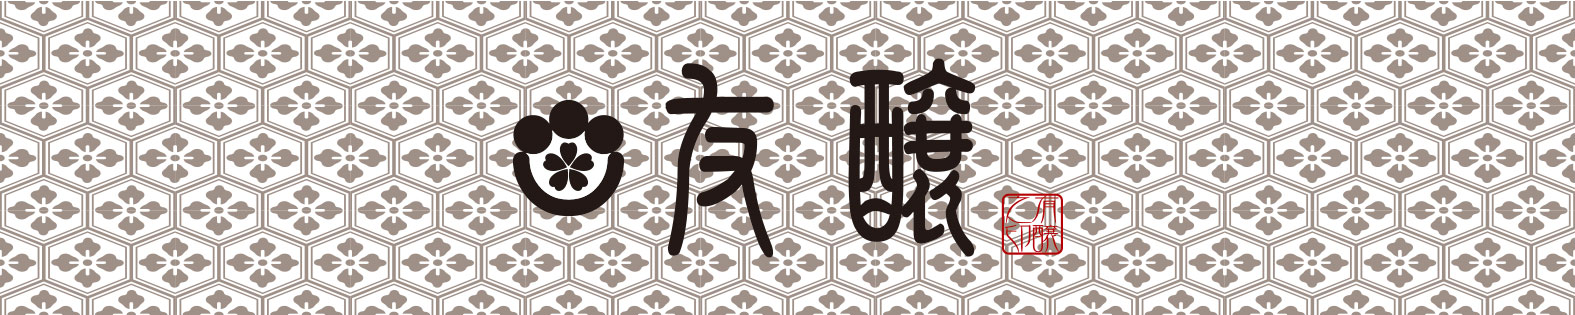 【日本酒】楯野川 春にごり 純米大吟醸 無濾過生酒 美山錦50 限定 新酒27BY_e0173738_9563290.jpg